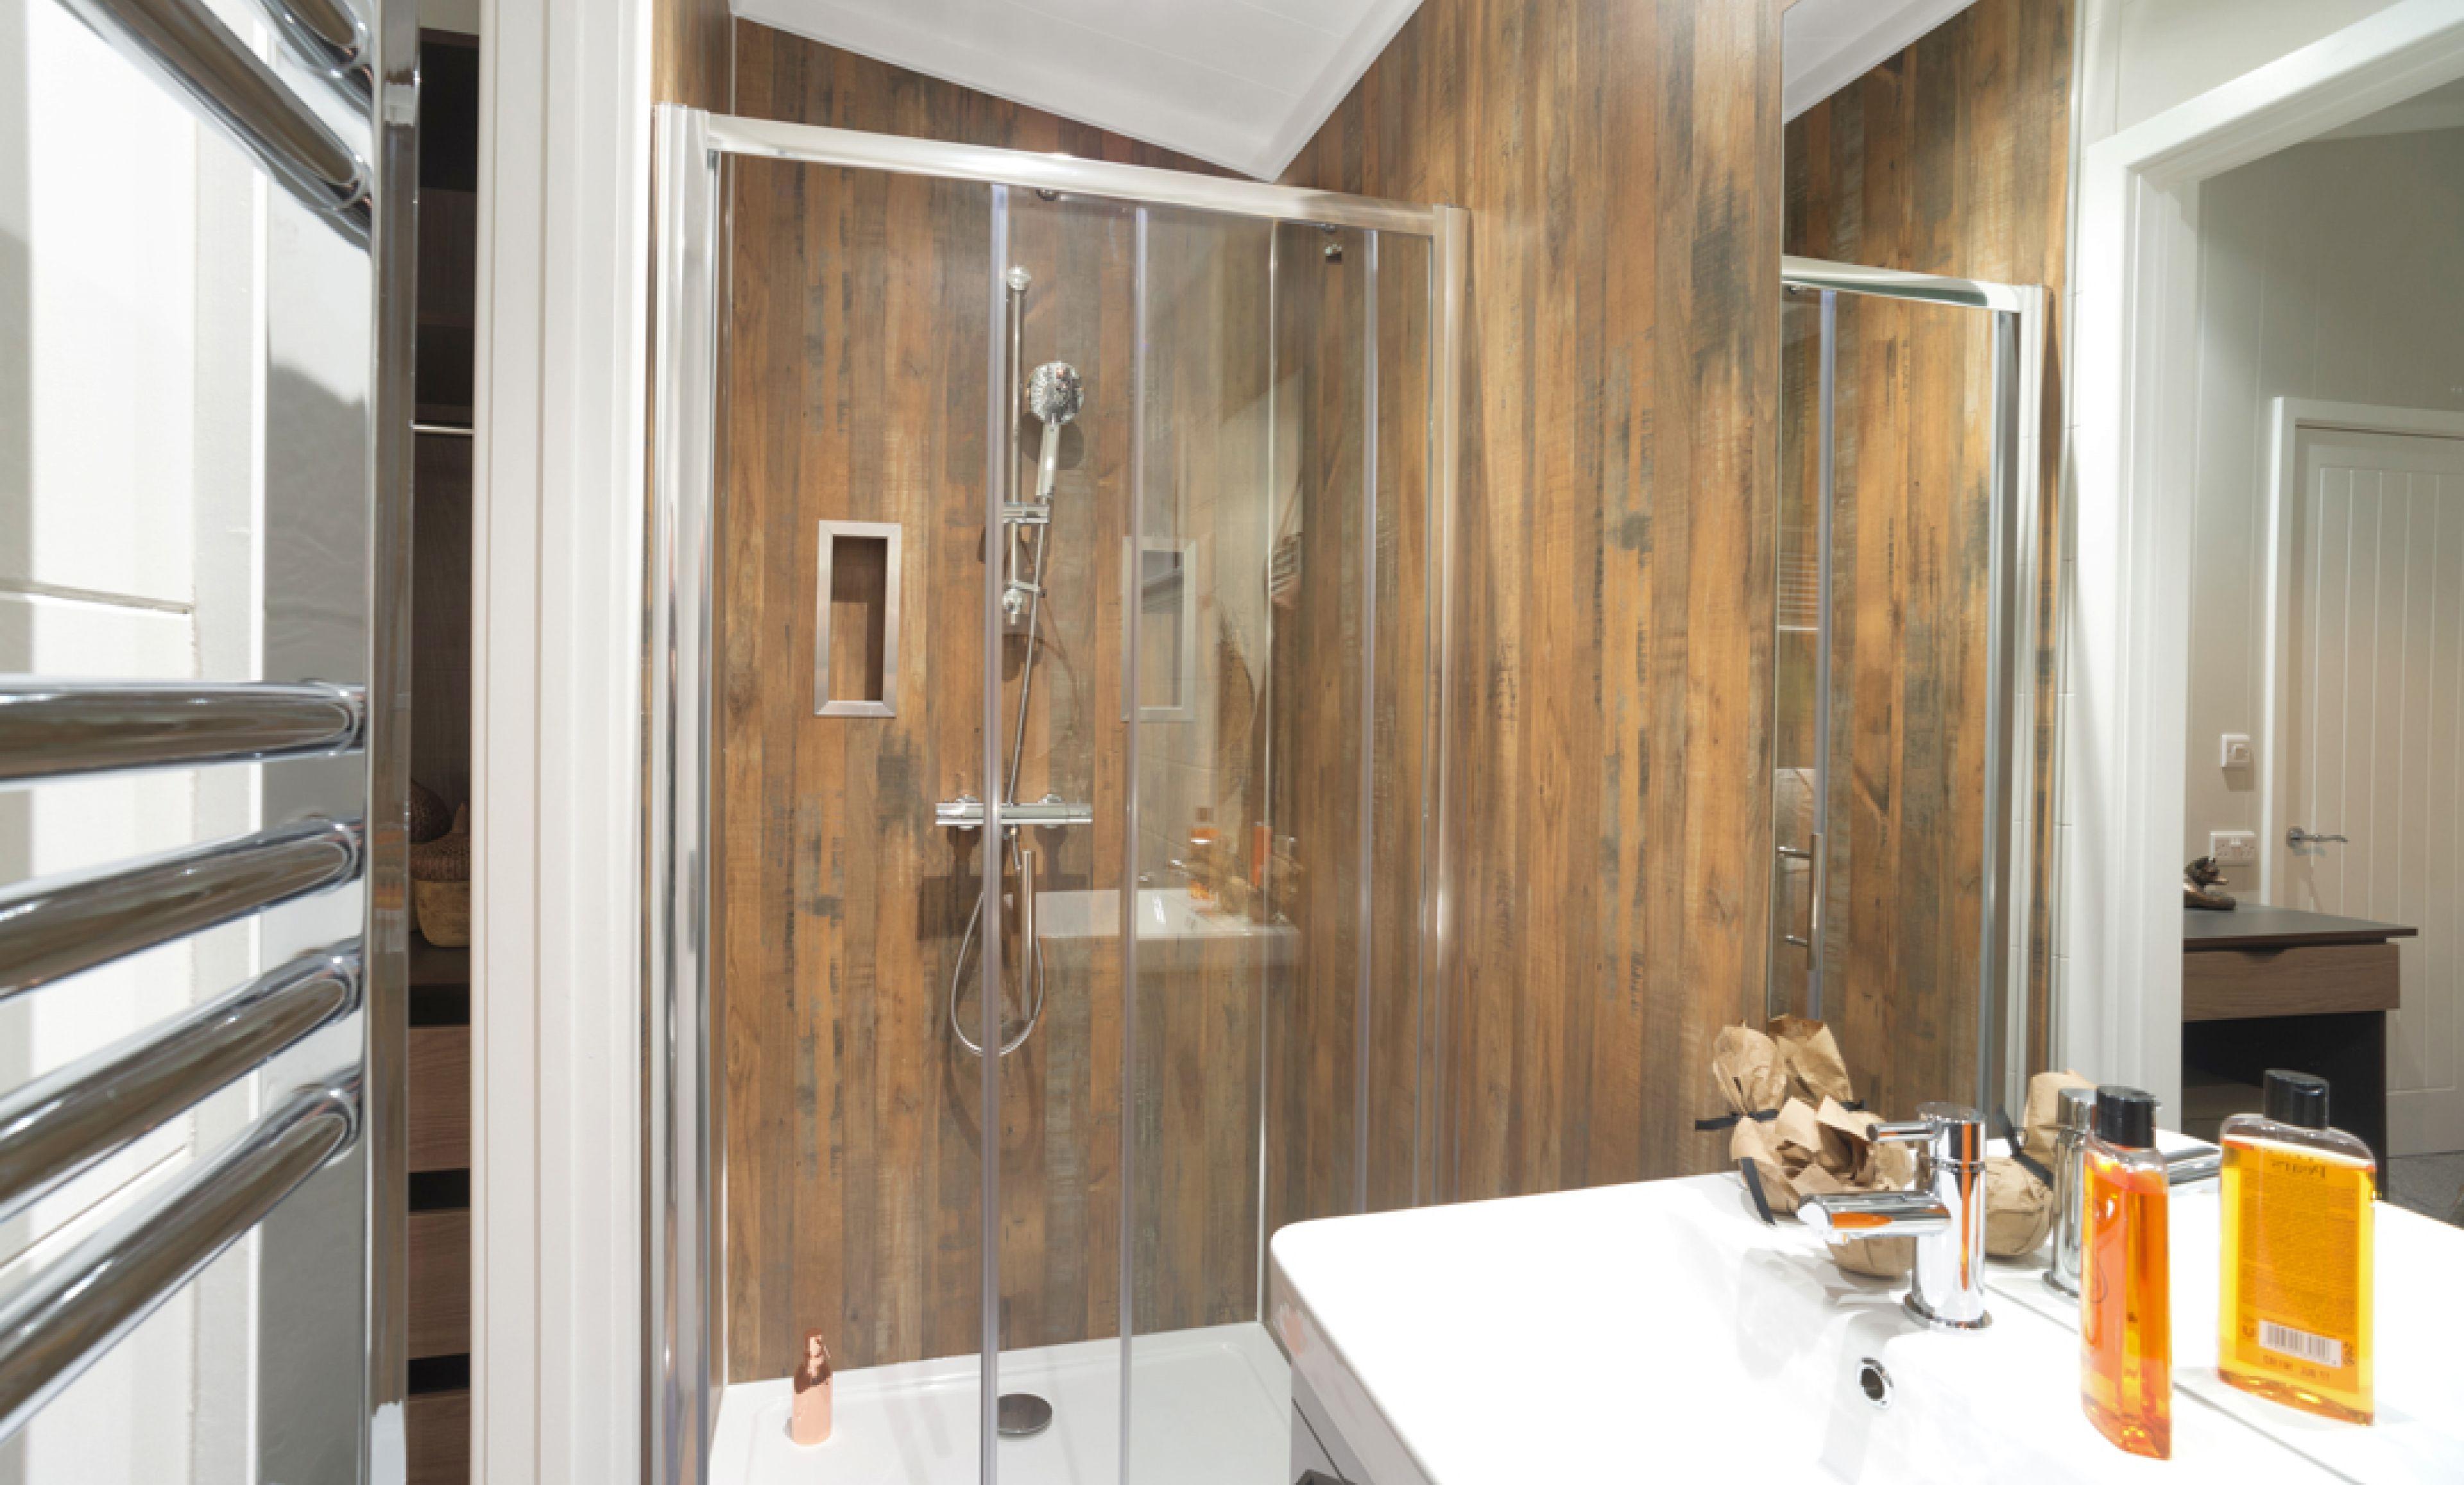 The Savannah Centre Lounge - Centre Lounge - Bathroom